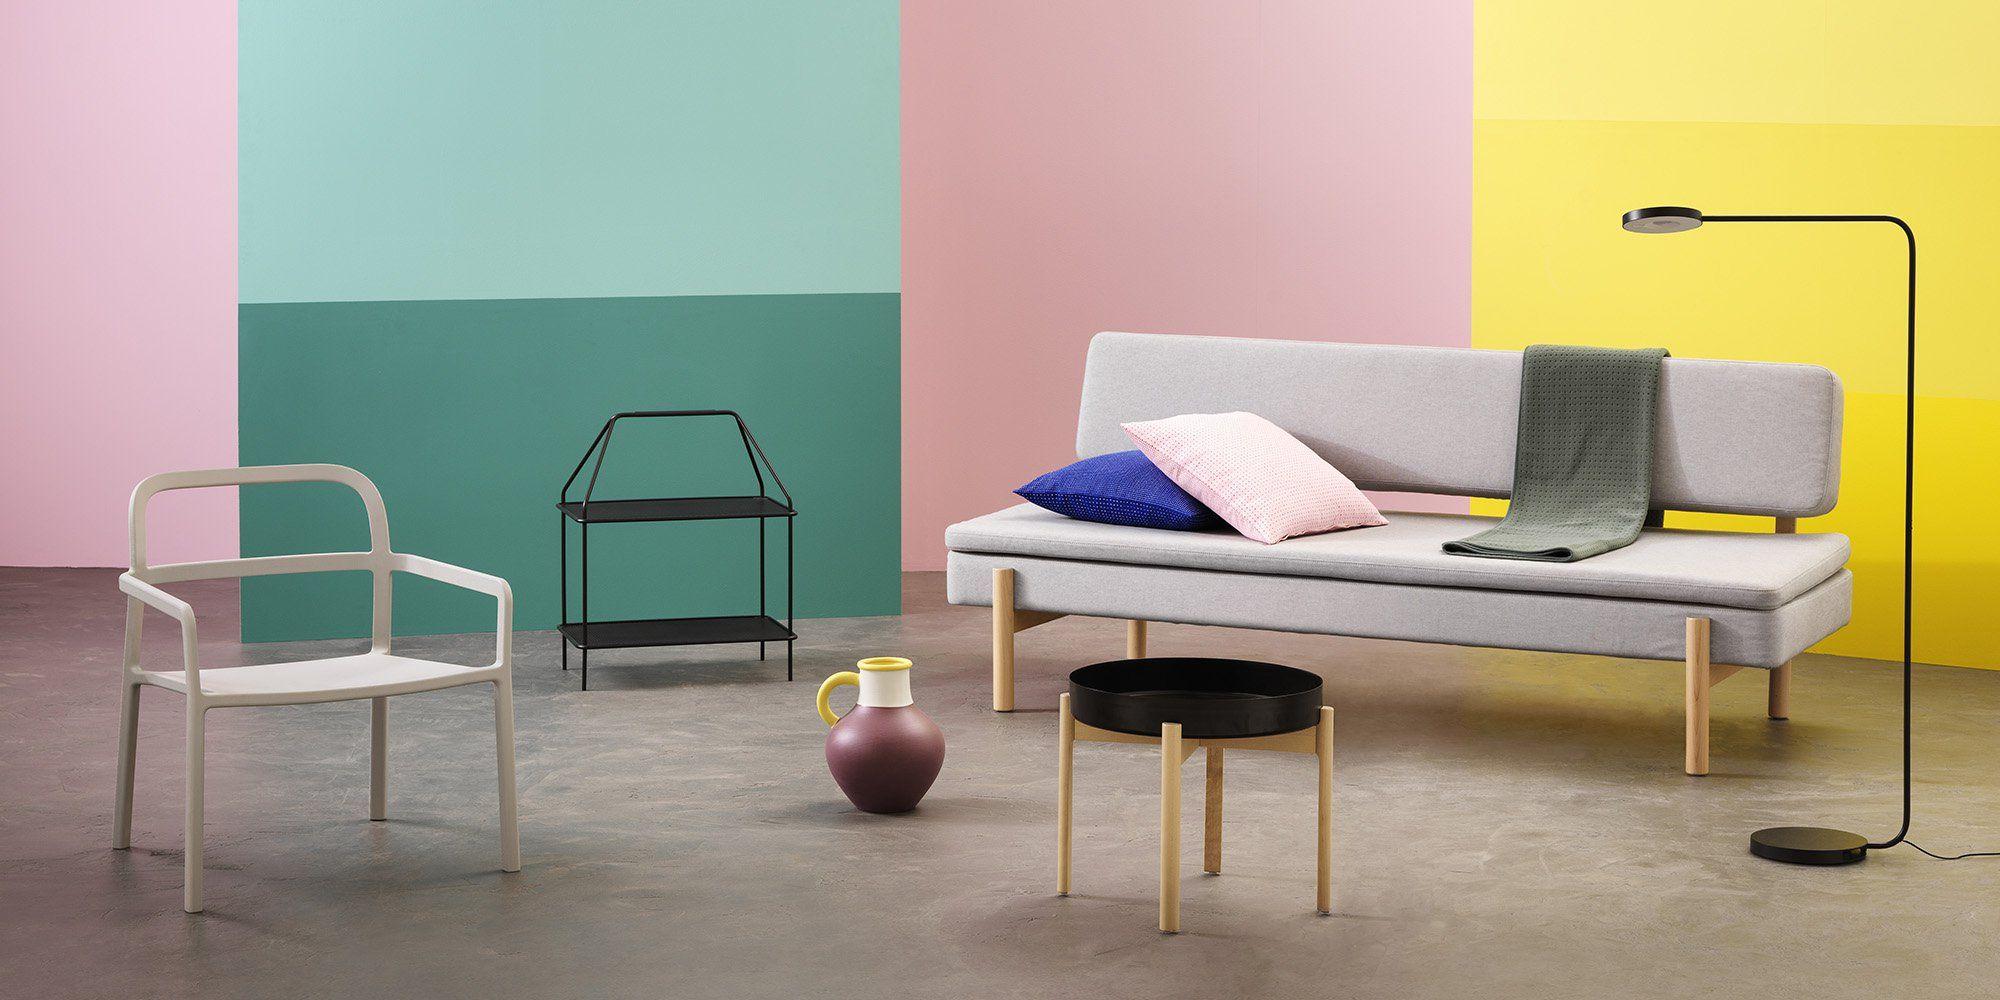 78020dc7676ebde8d1a03fa80e4224ba Impressionnant De Table Gigogne Ikea Concept